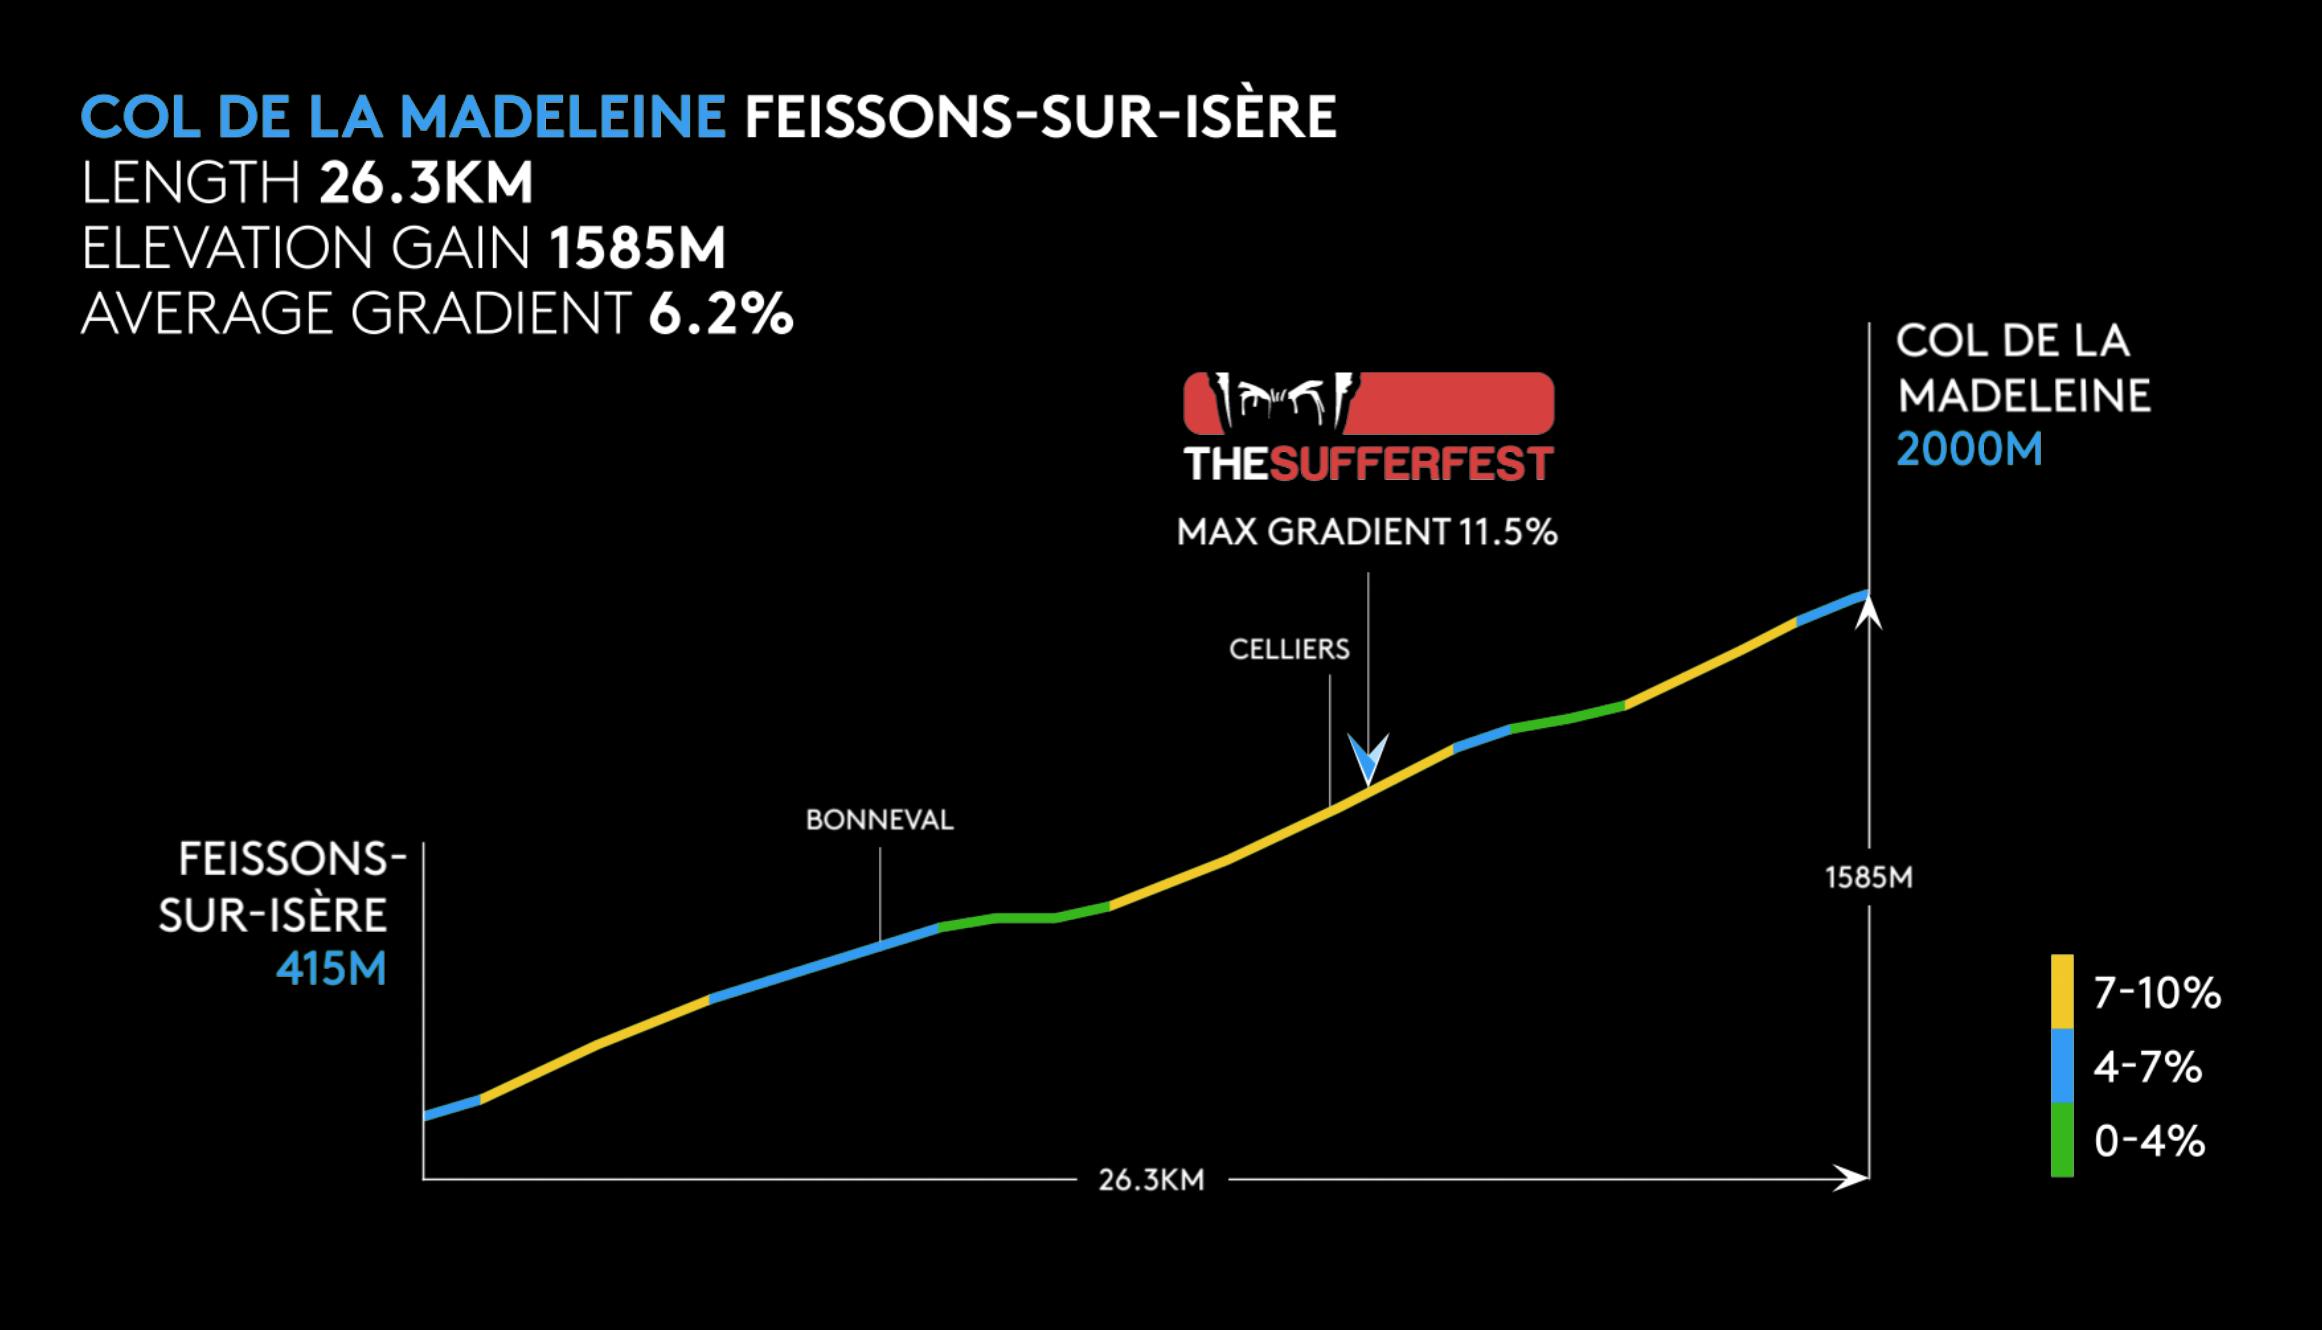 Col de la Madeleine Profile